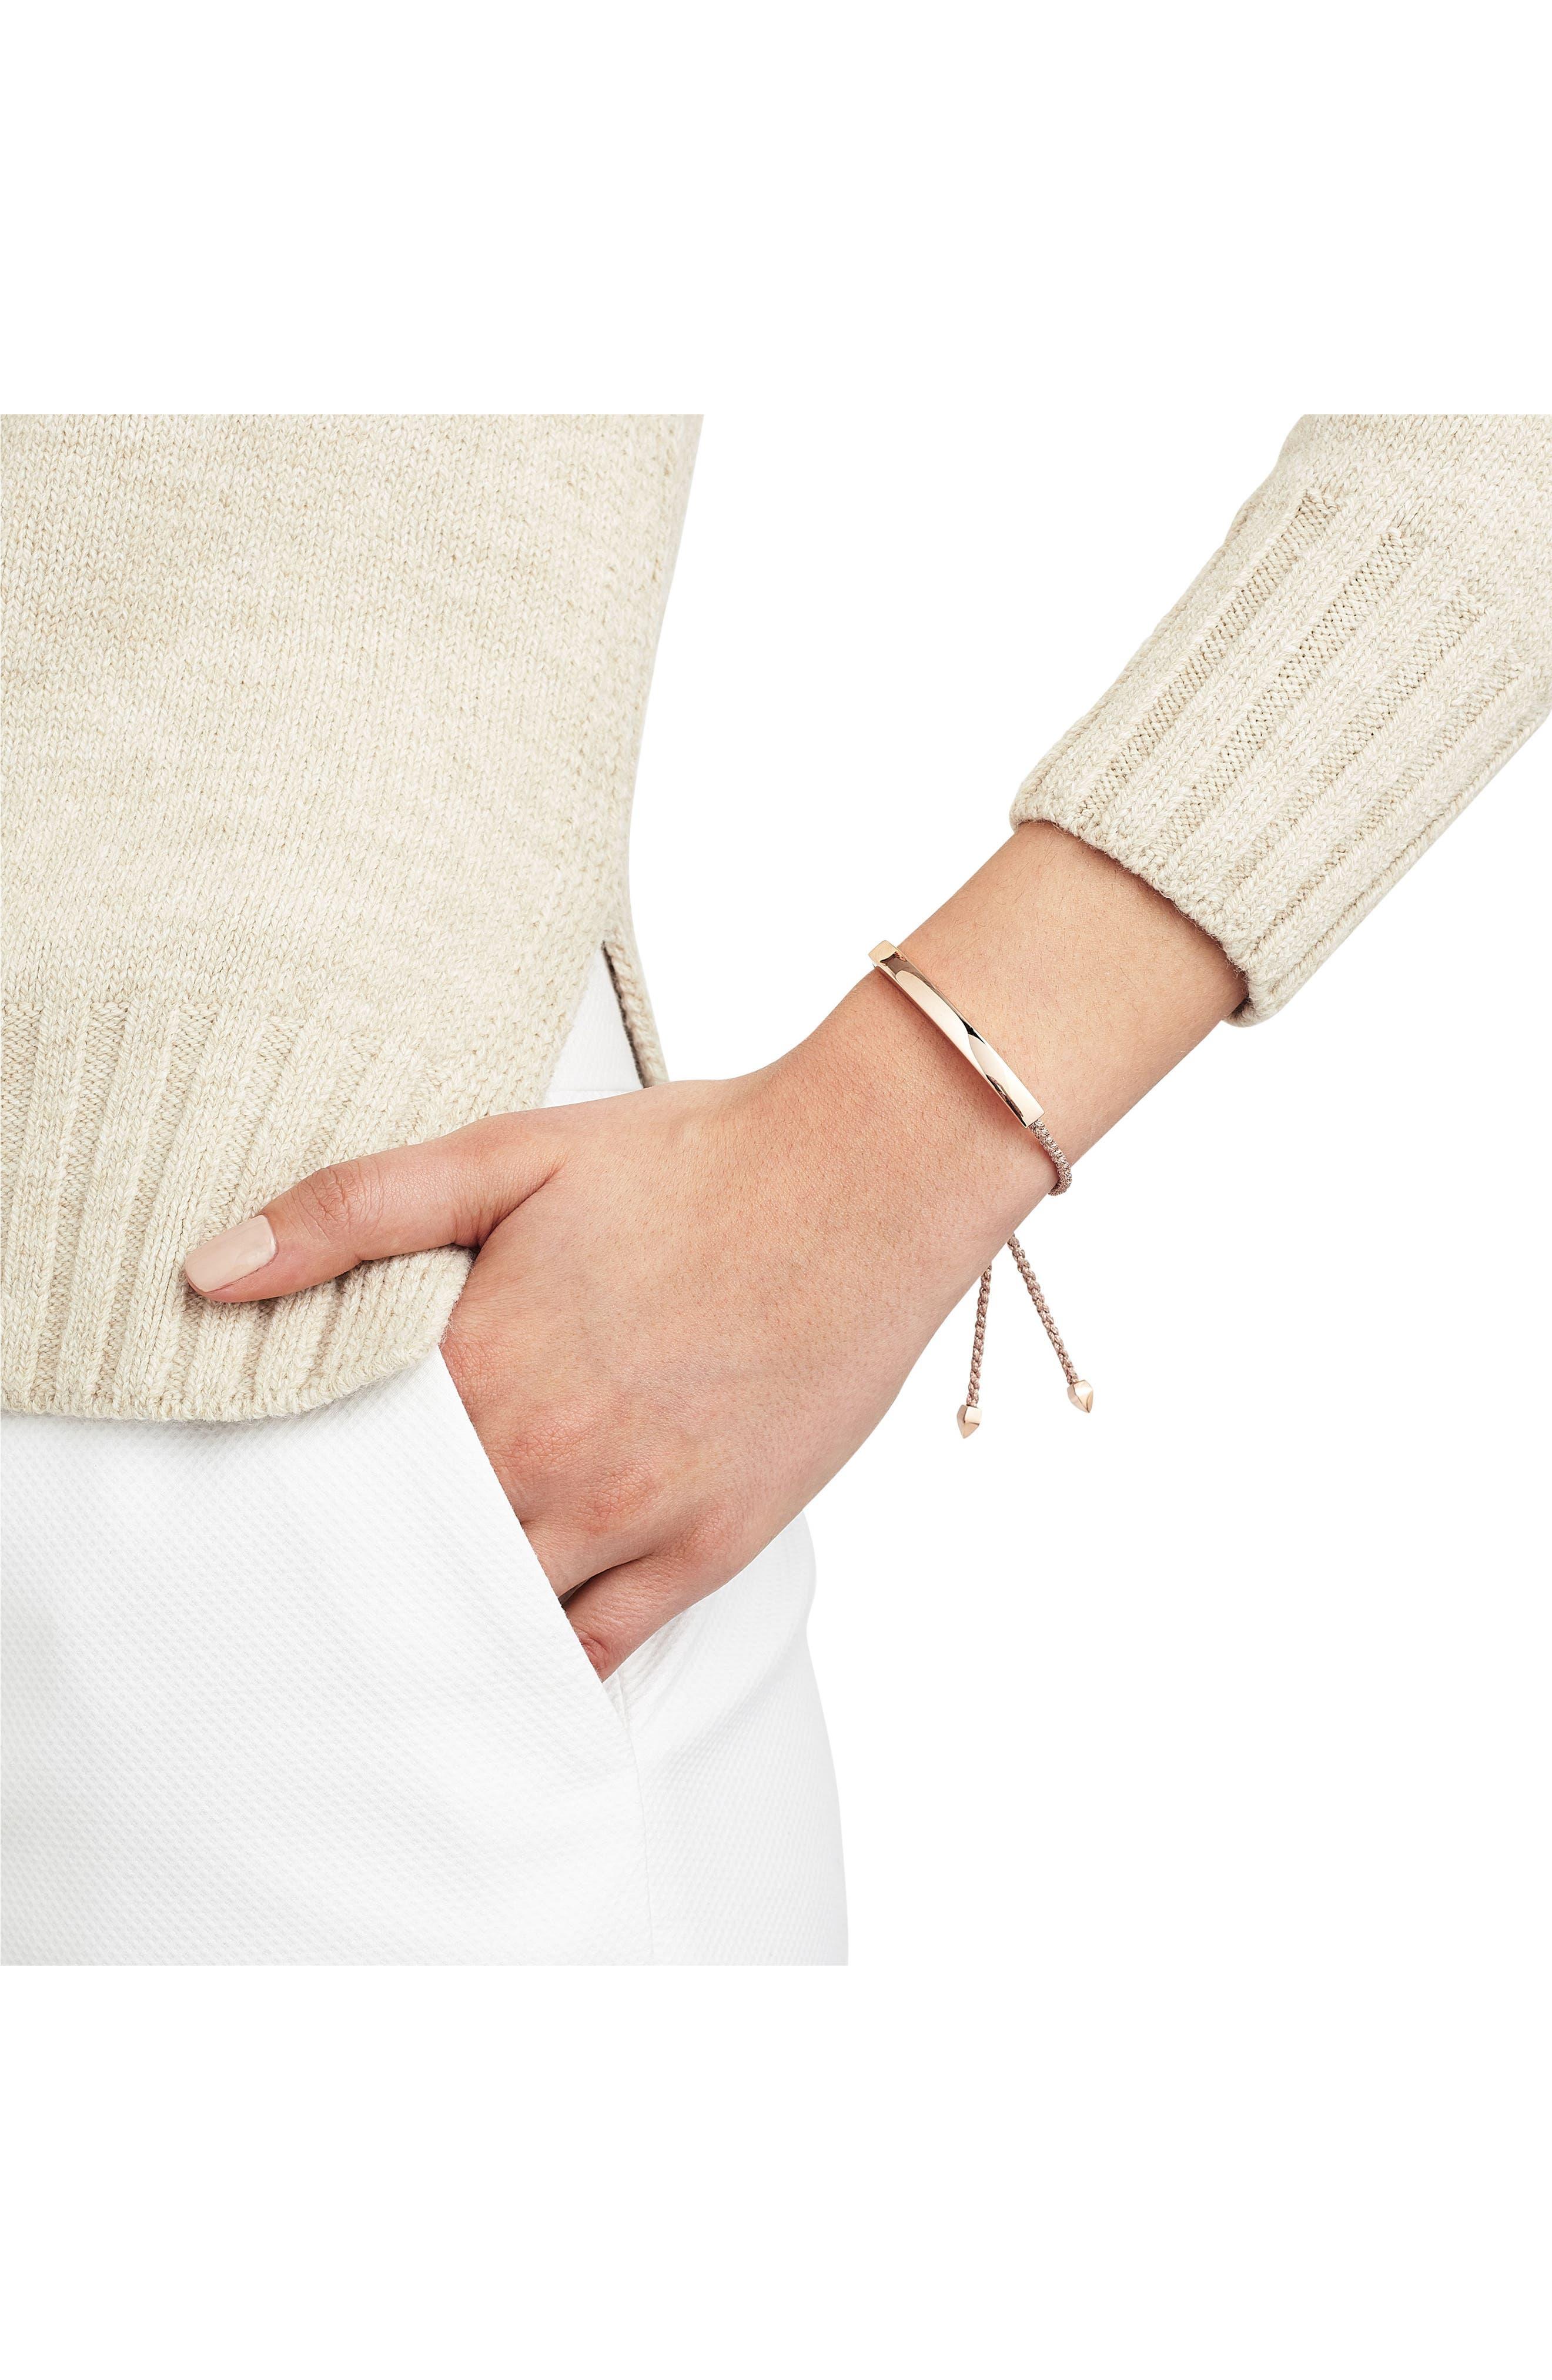 Engravable Large Linear Friendship Bracelet,                             Alternate thumbnail 2, color,                             METALLIC/ ROSE GOLD